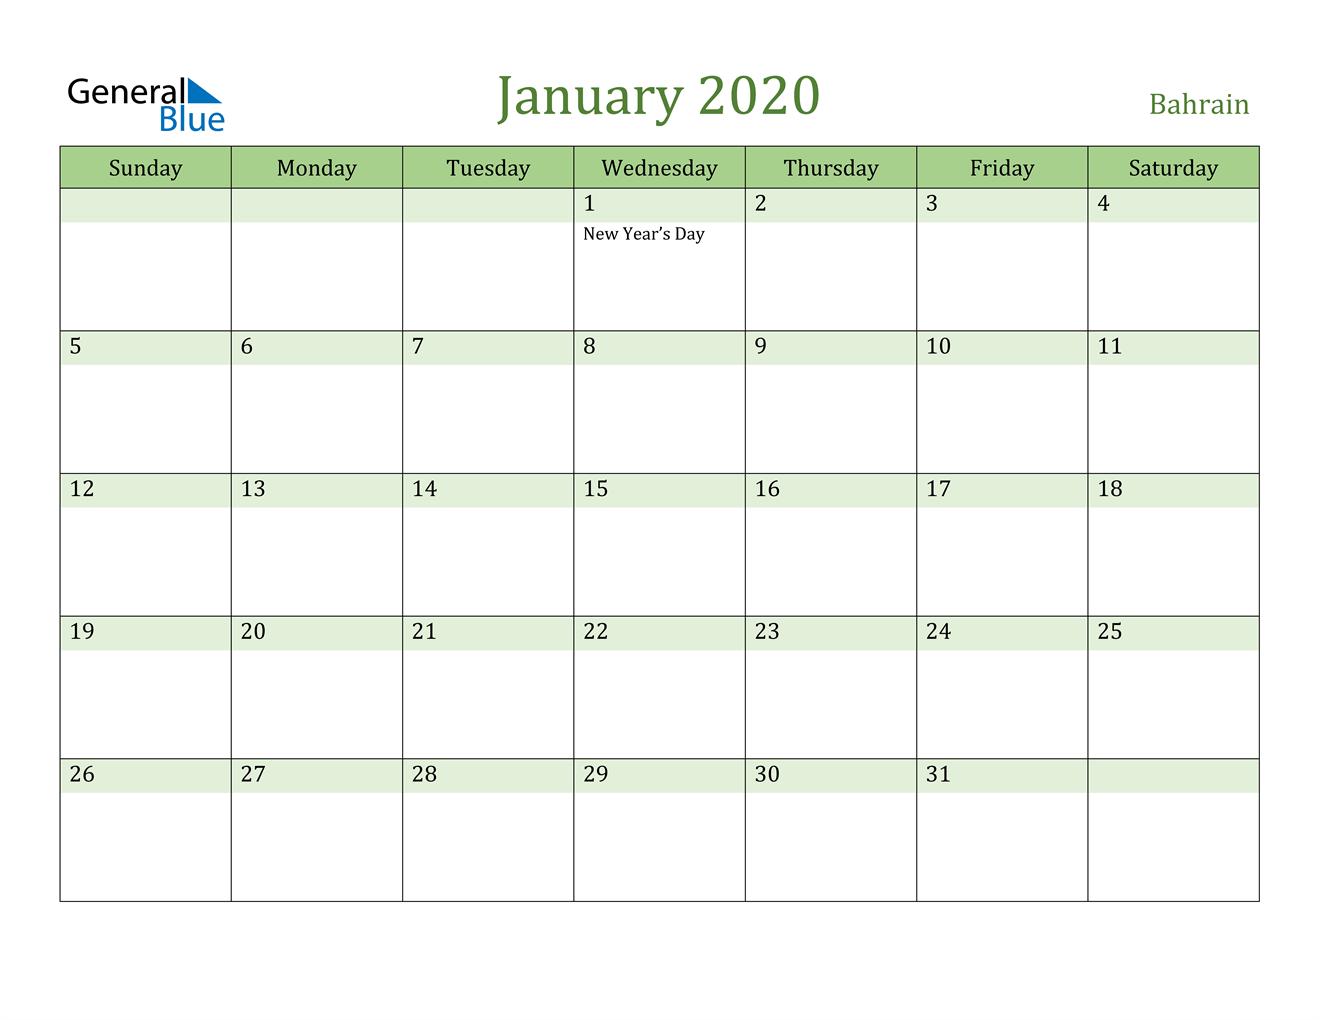 Image of January 2020 Cool and Relaxing Green Calendar Calendar